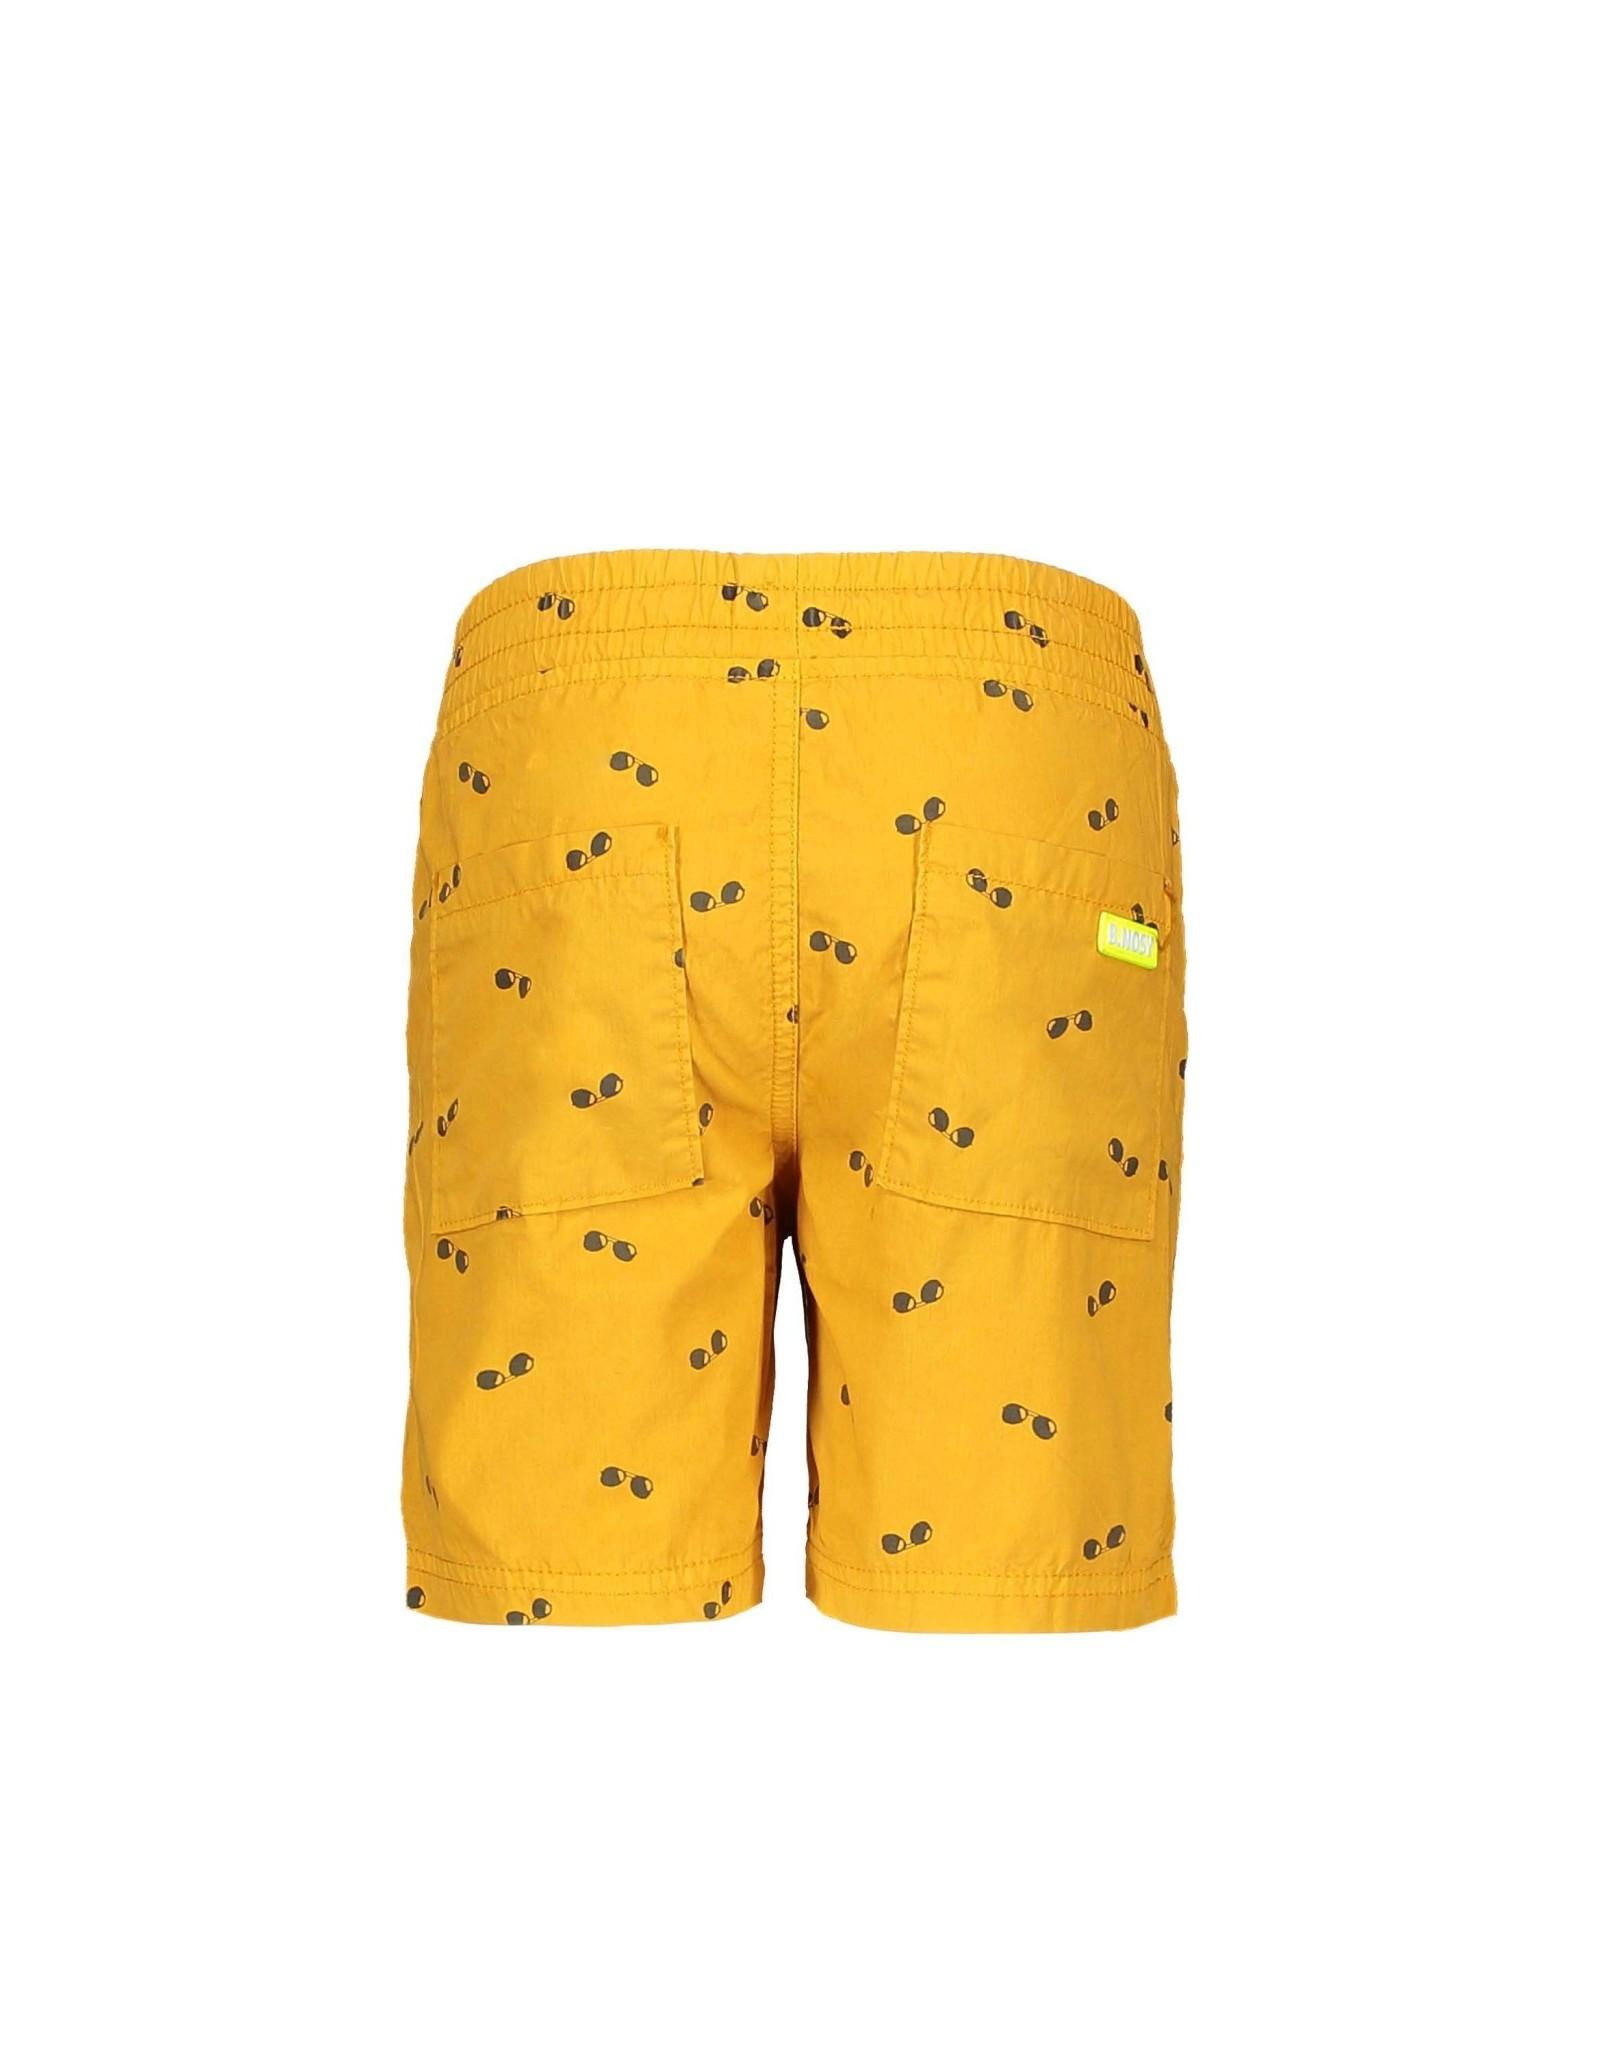 B.Nosy B.Nosy jongens korte broek Sunglasses Melee Print Mustard